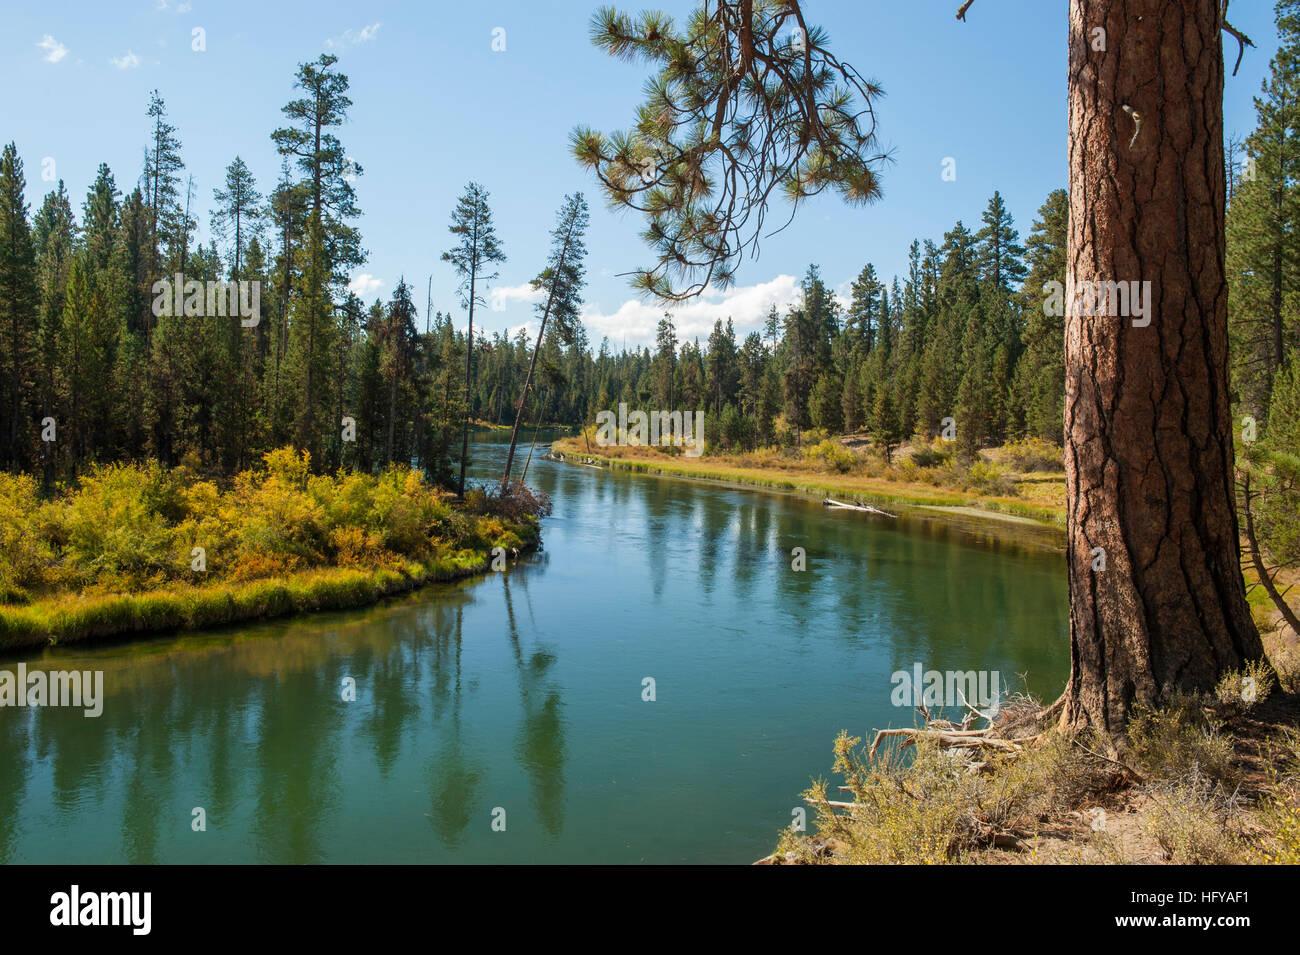 Oregon's Deschutes River at Bull Bend - Stock Image